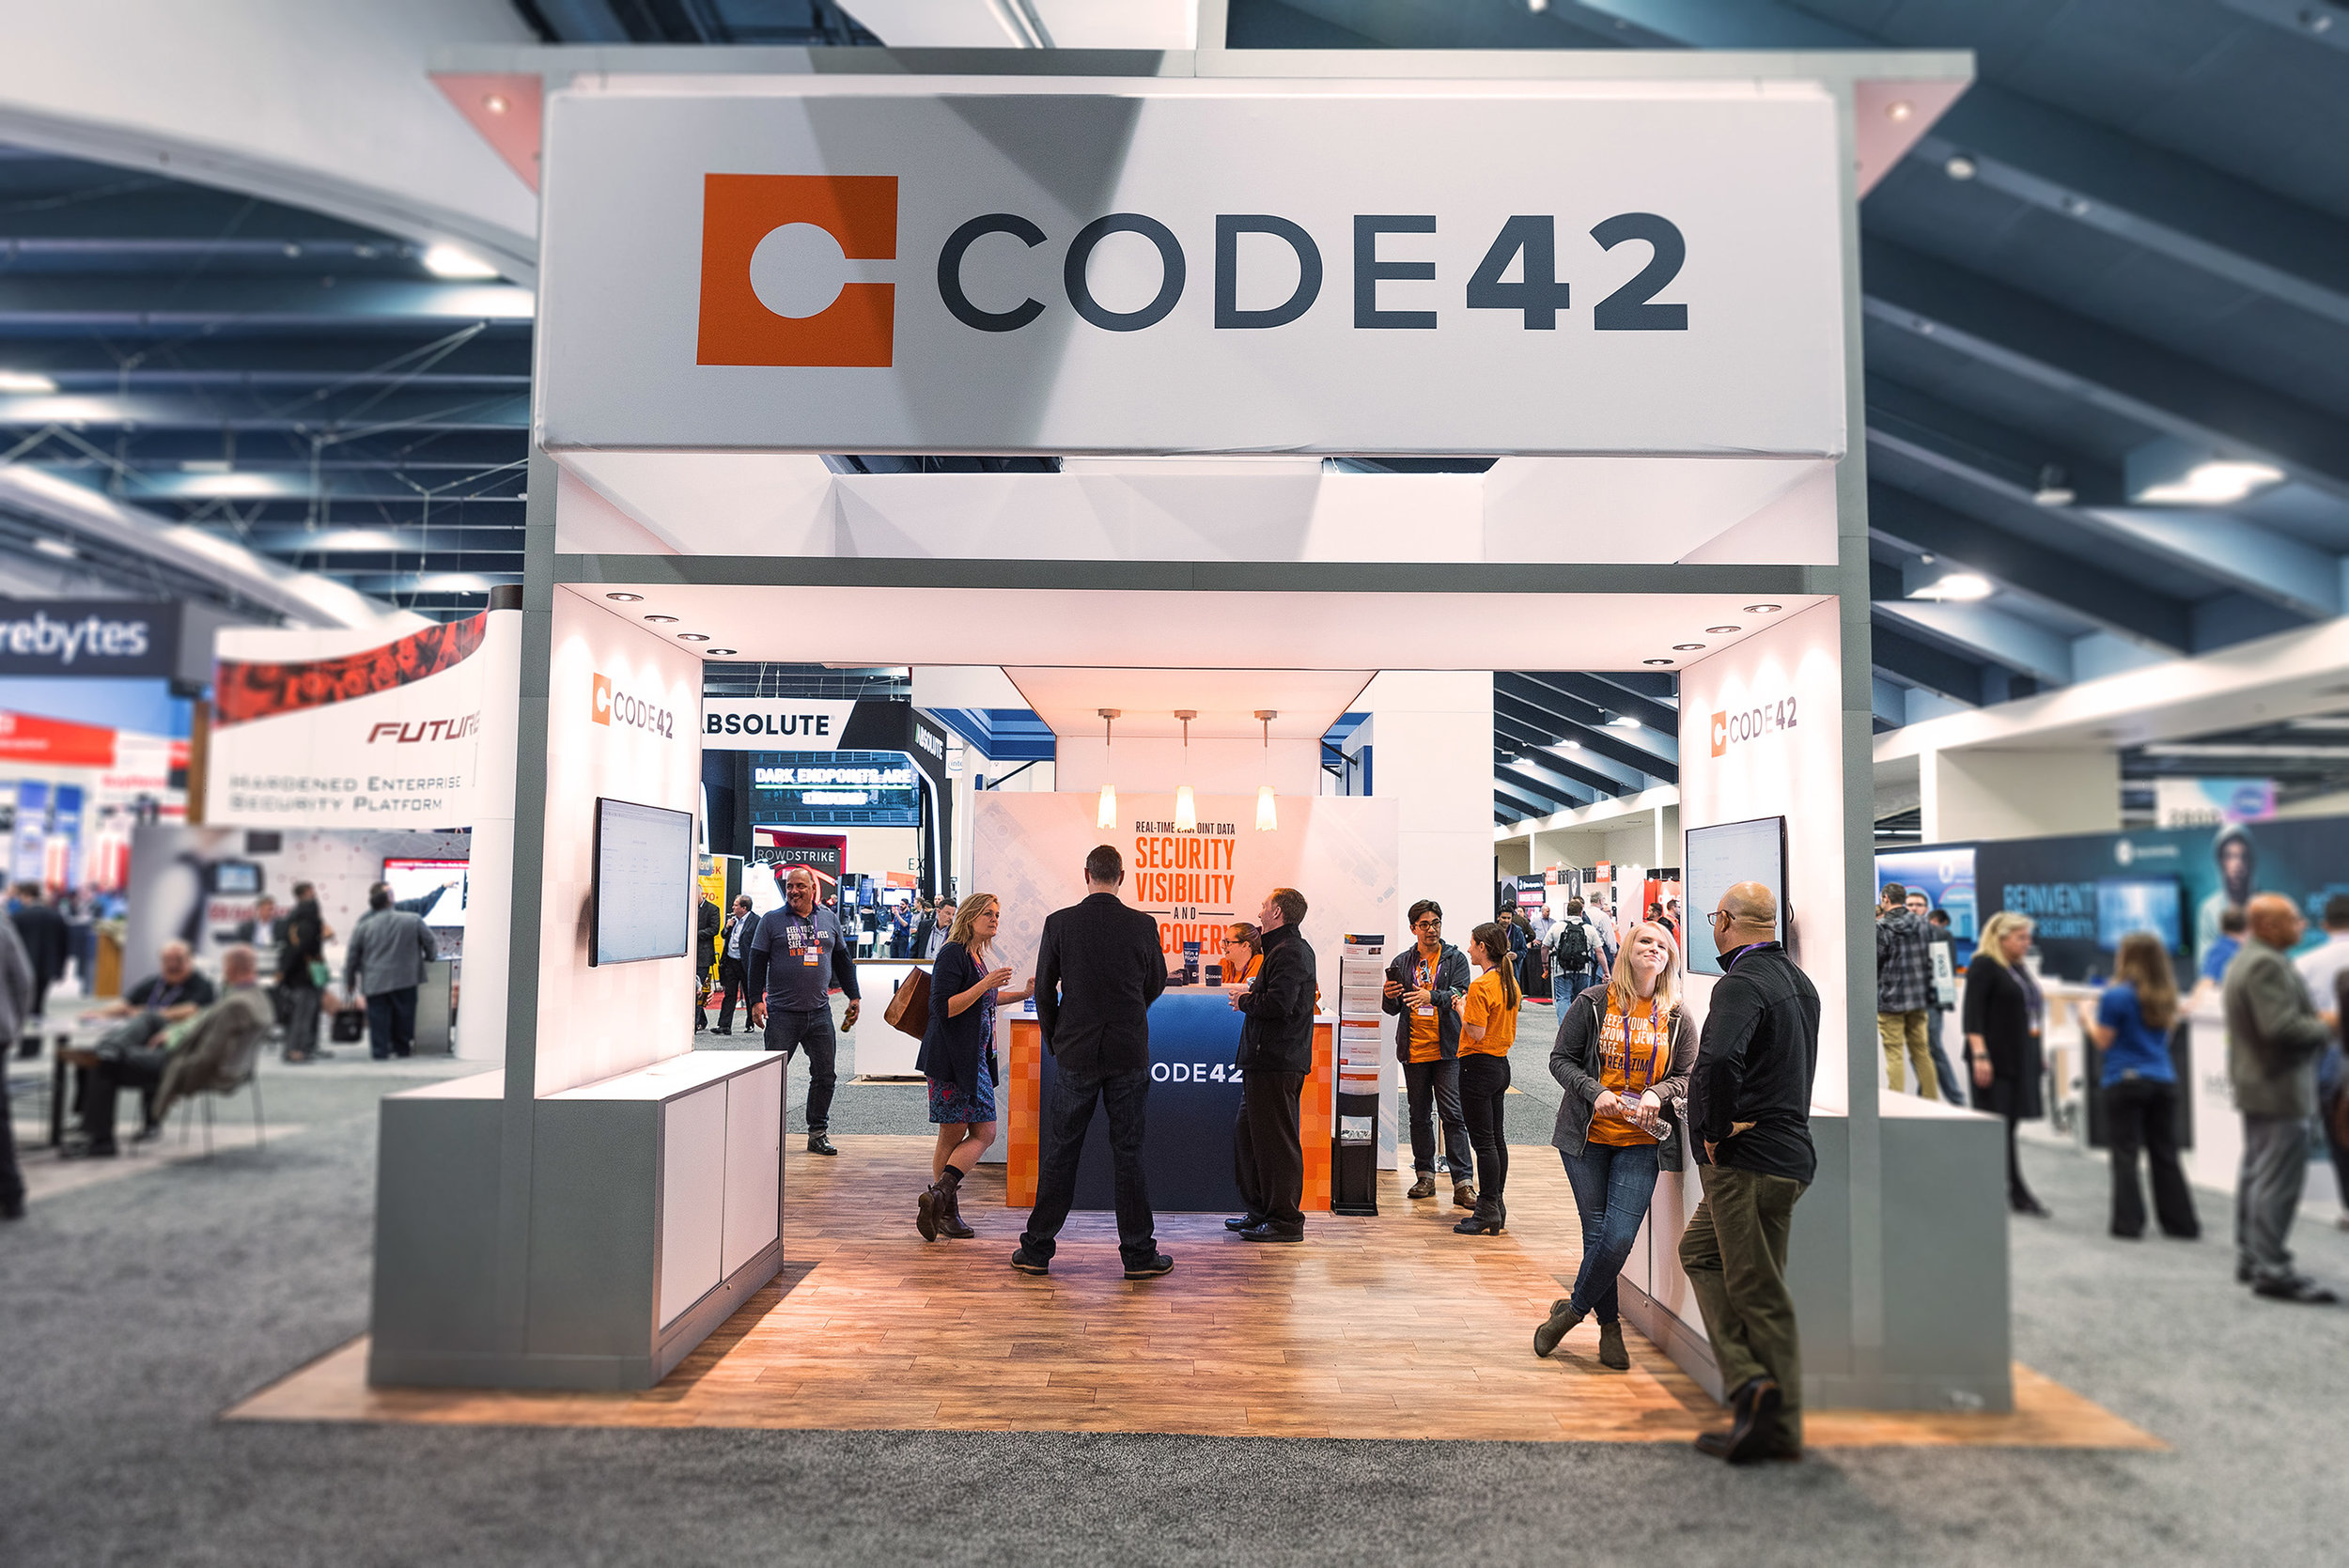 cd42-booth-8.jpg